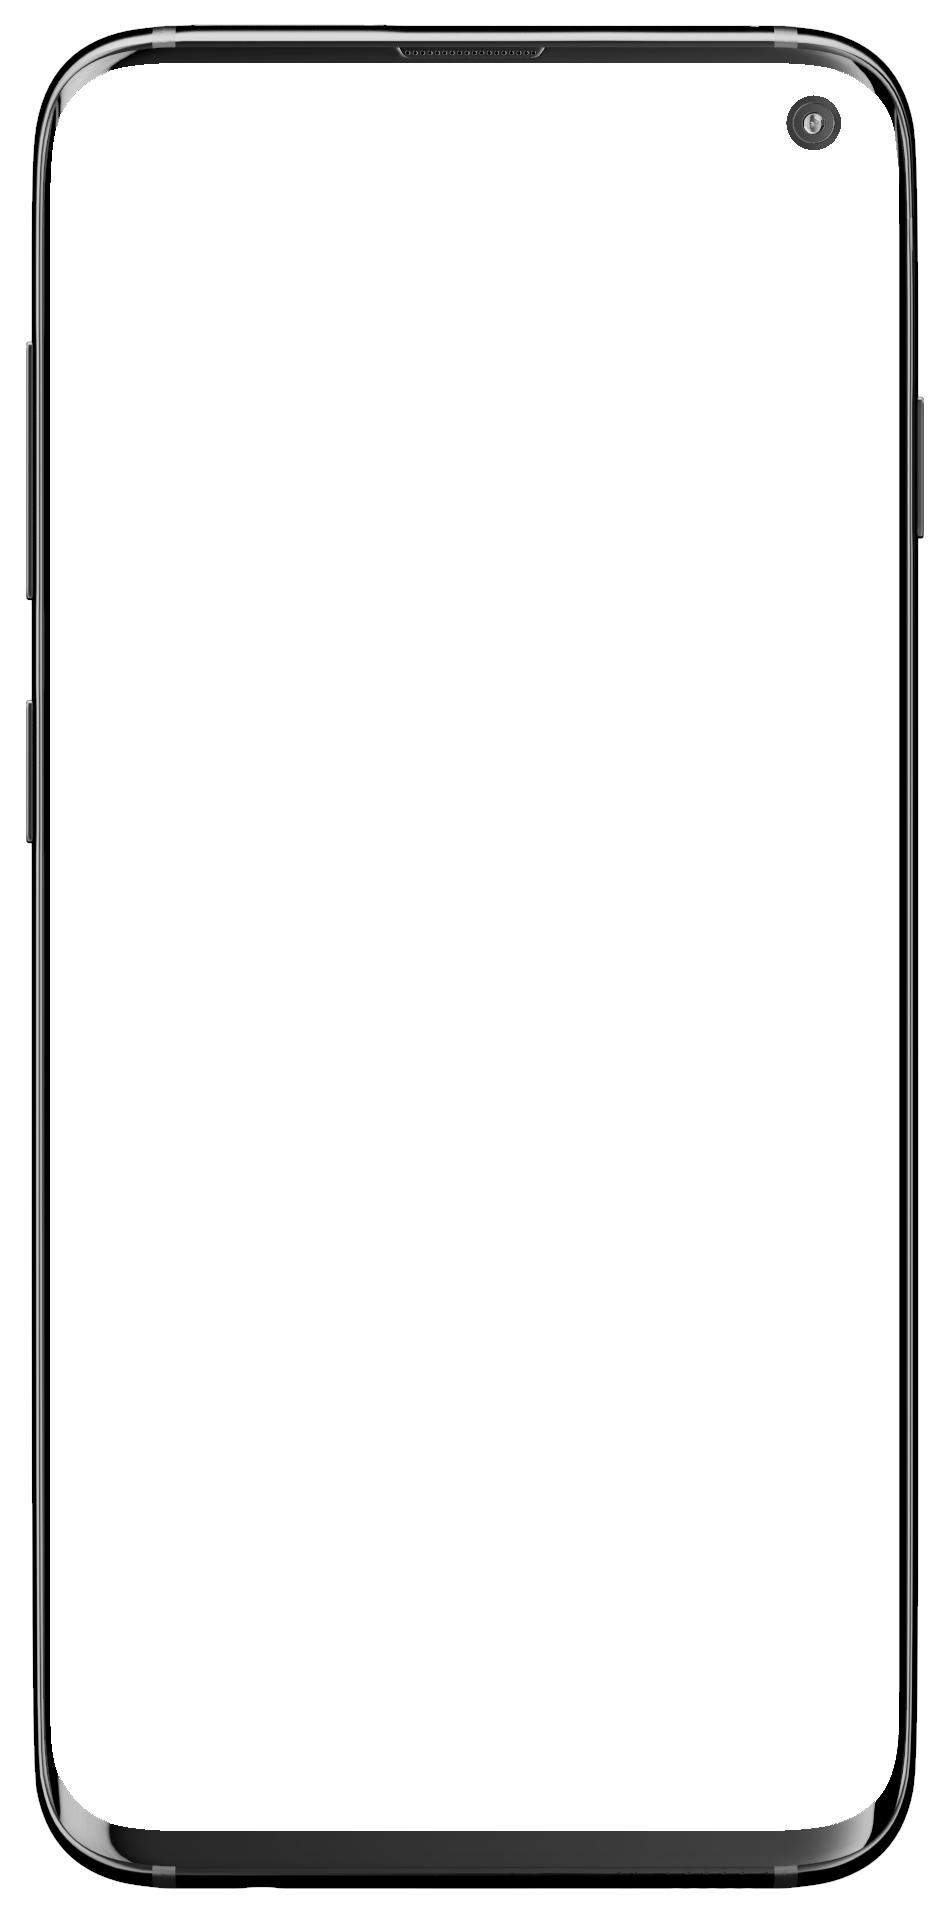 Mochup of a modern smartphone